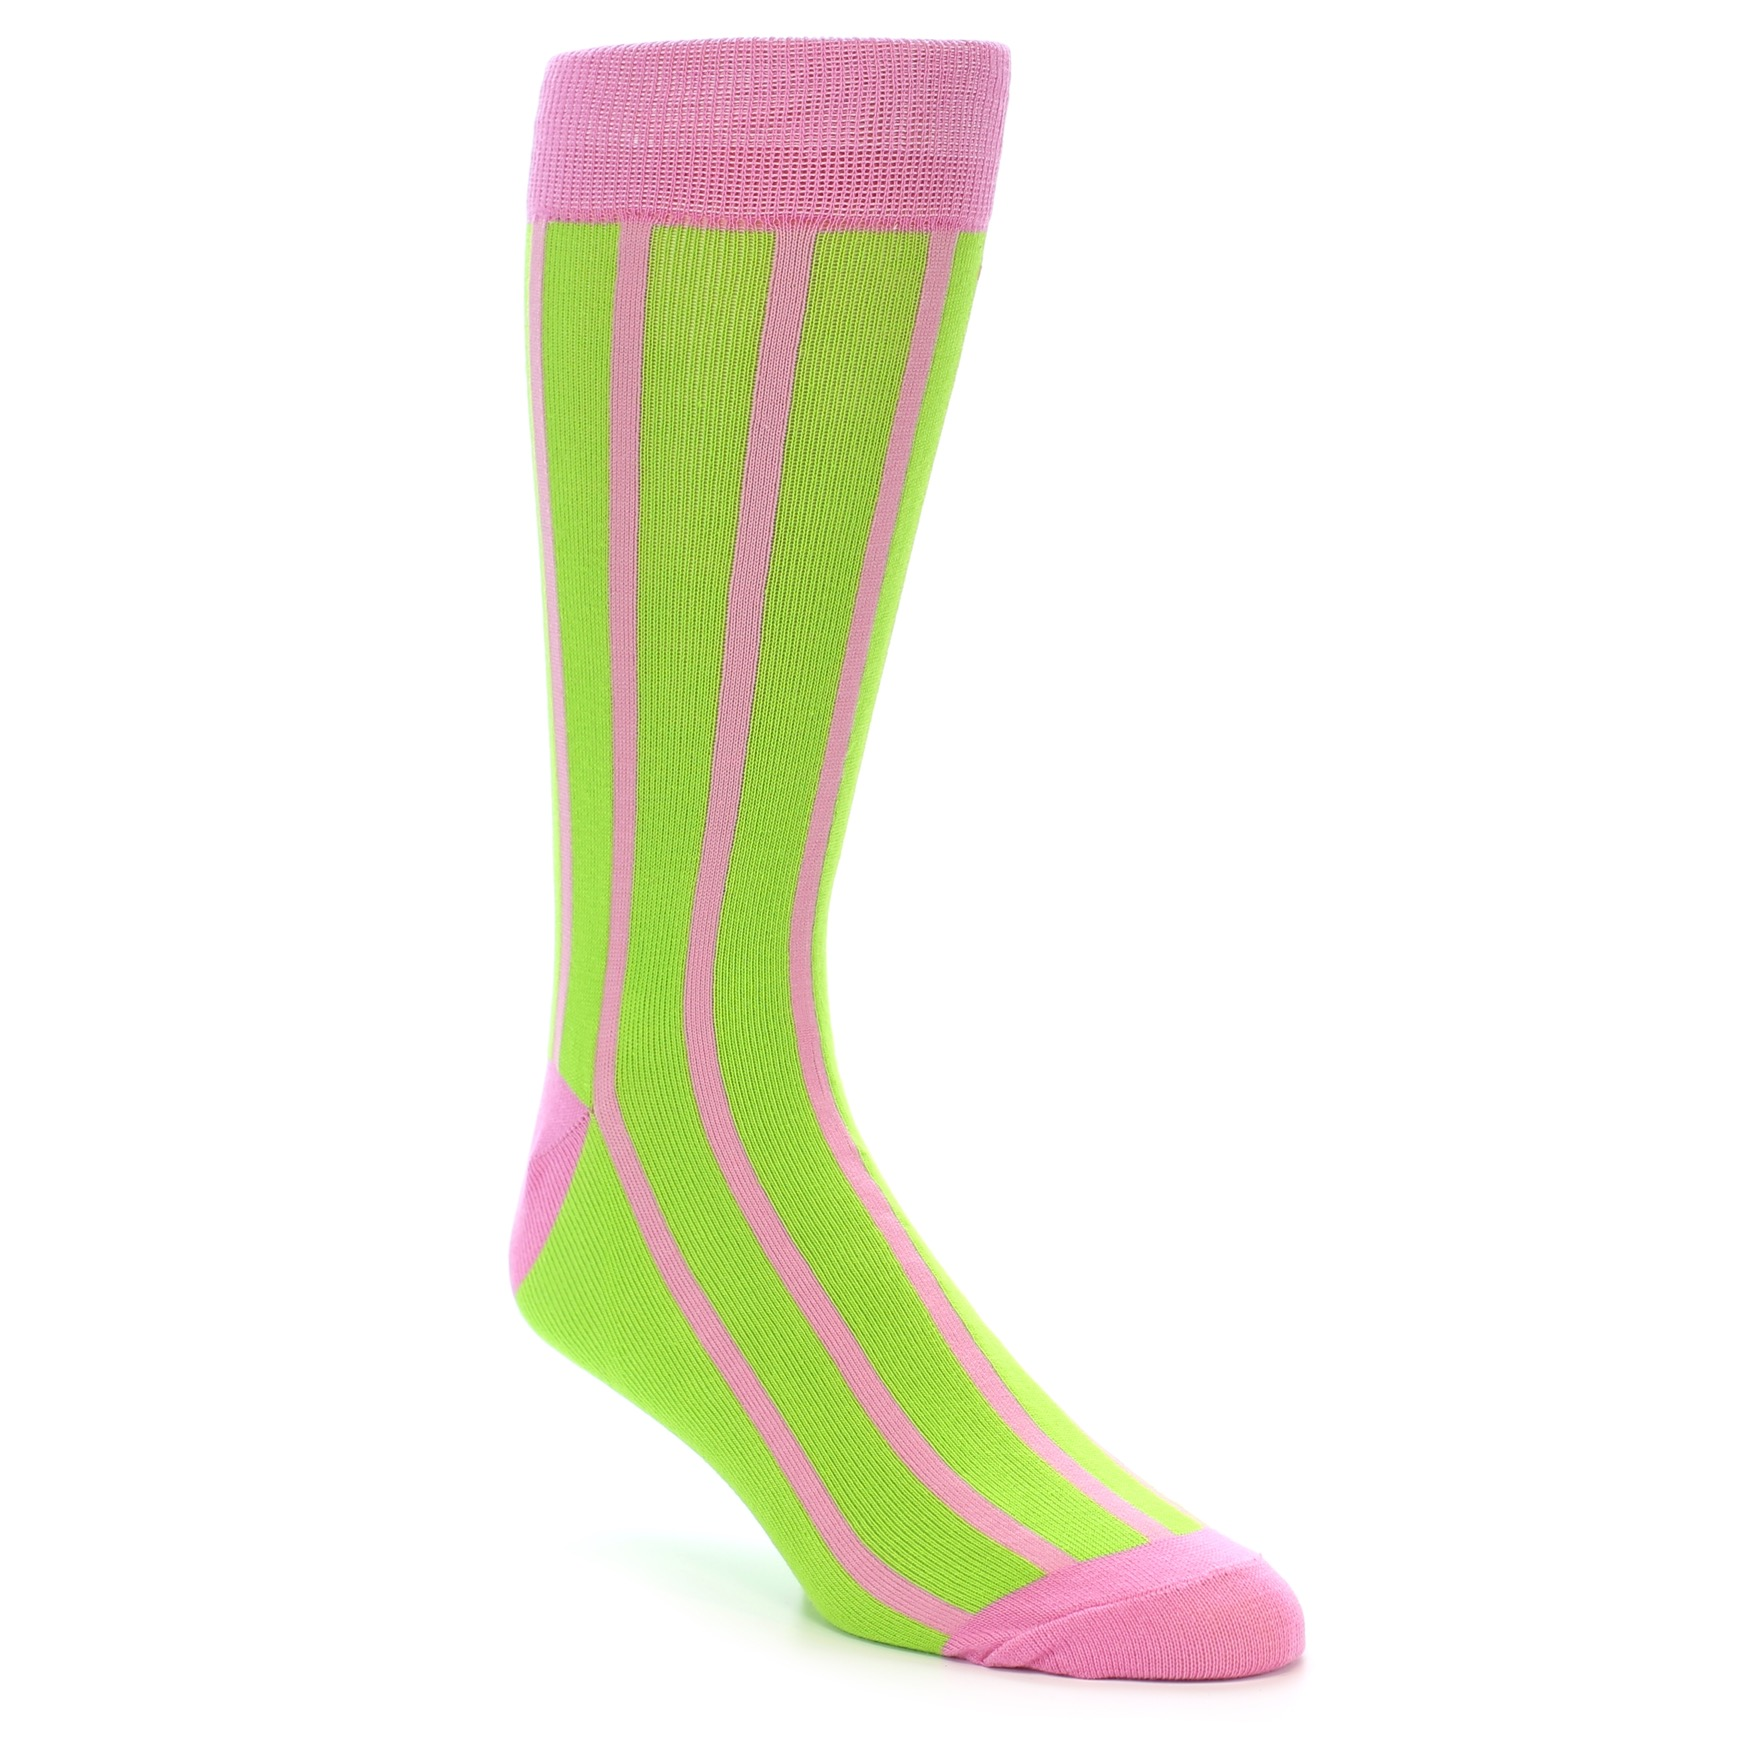 b596f793d4aeb Lime Pink Vertical Stripe Men's Dress Socks | boldSOCKS